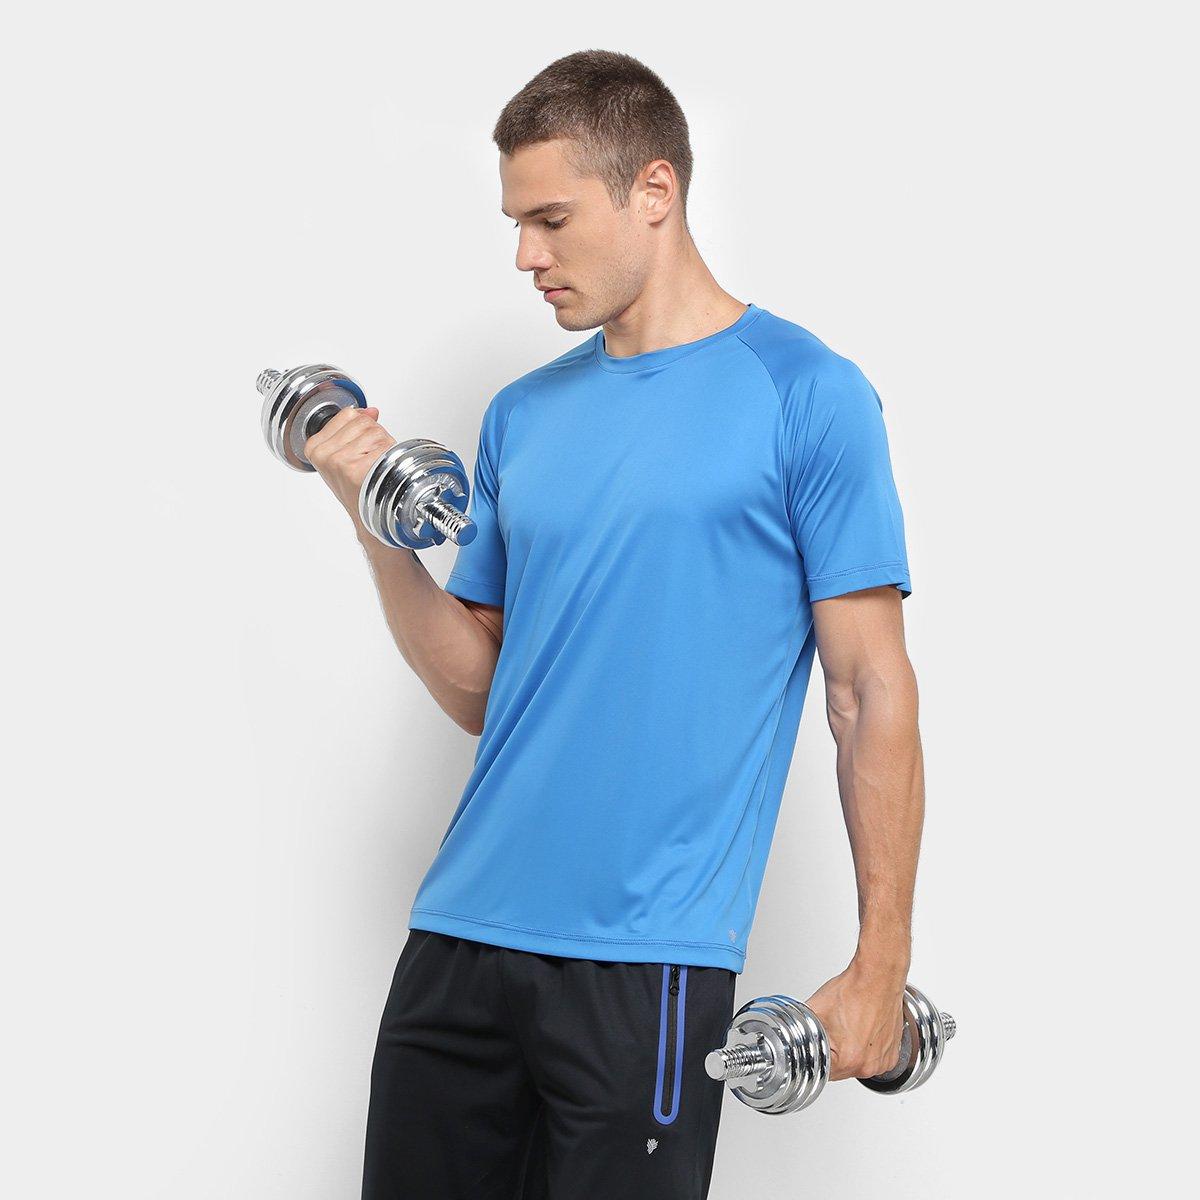 Oferta ➤ Camiseta Gonew Workout Masculina – Azul   . Veja essa promoção